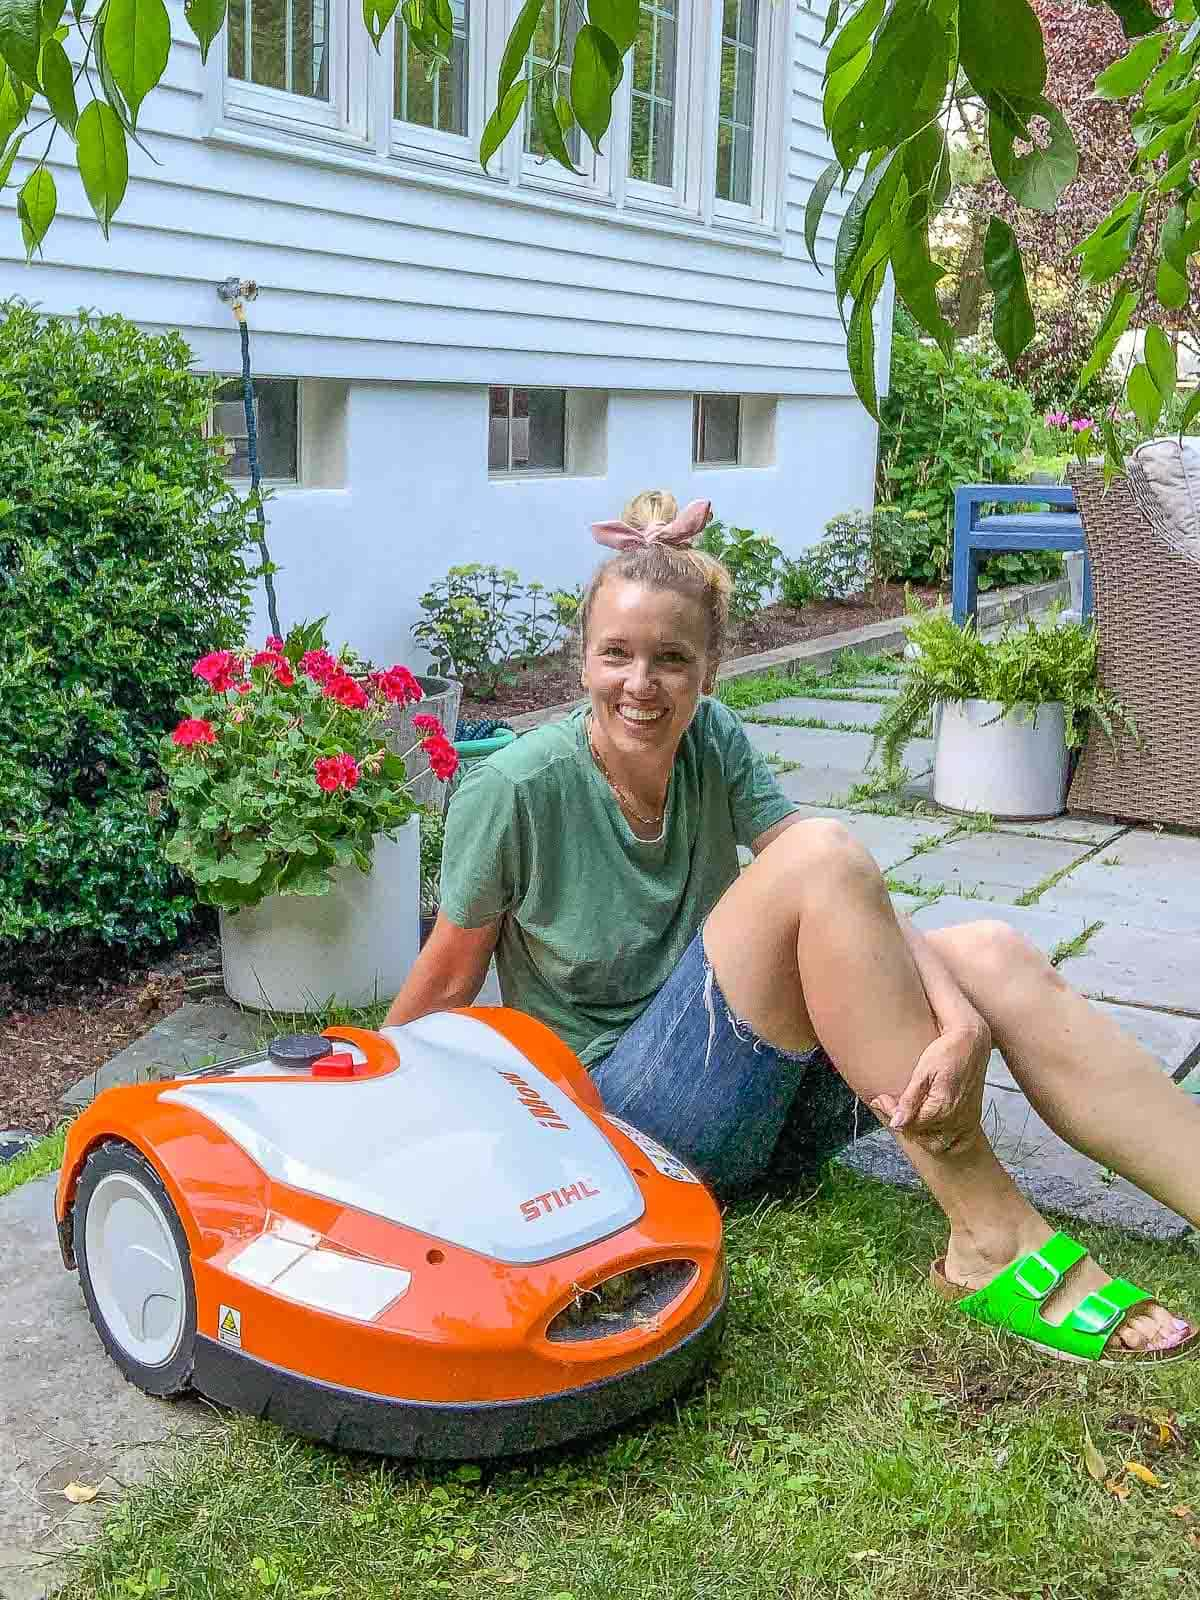 iMow robot lawn mower